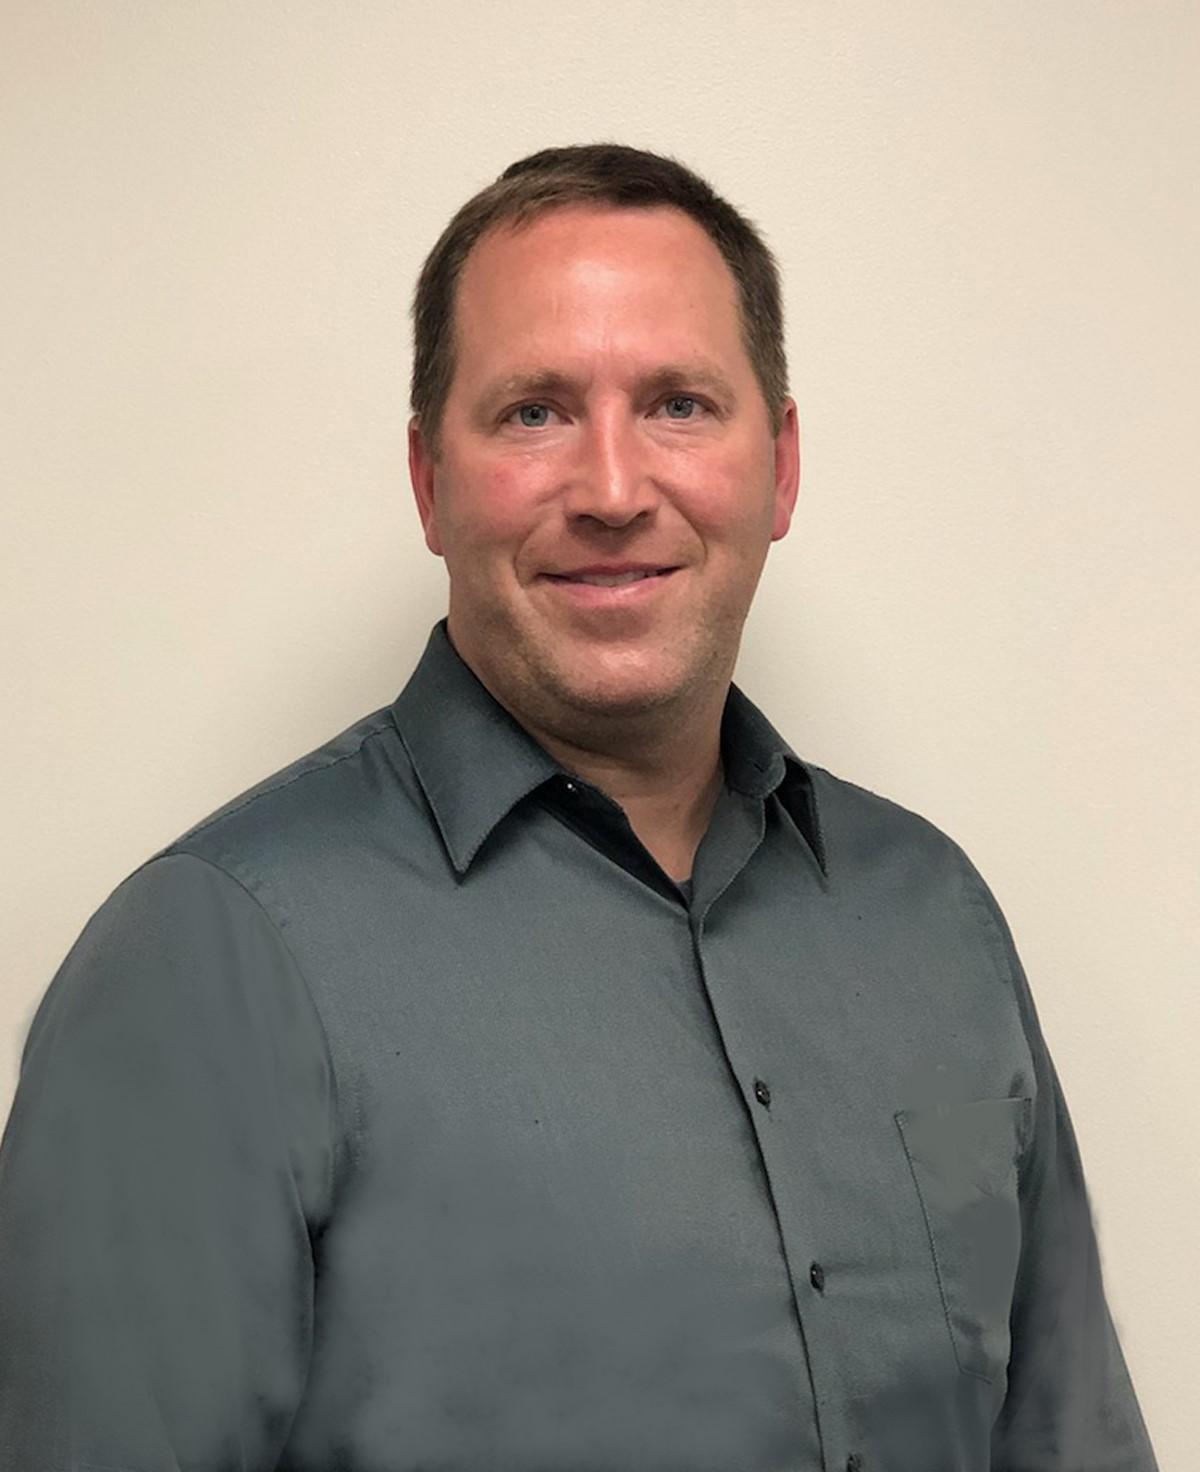 Jeffrey A. Yount, II, PA-C